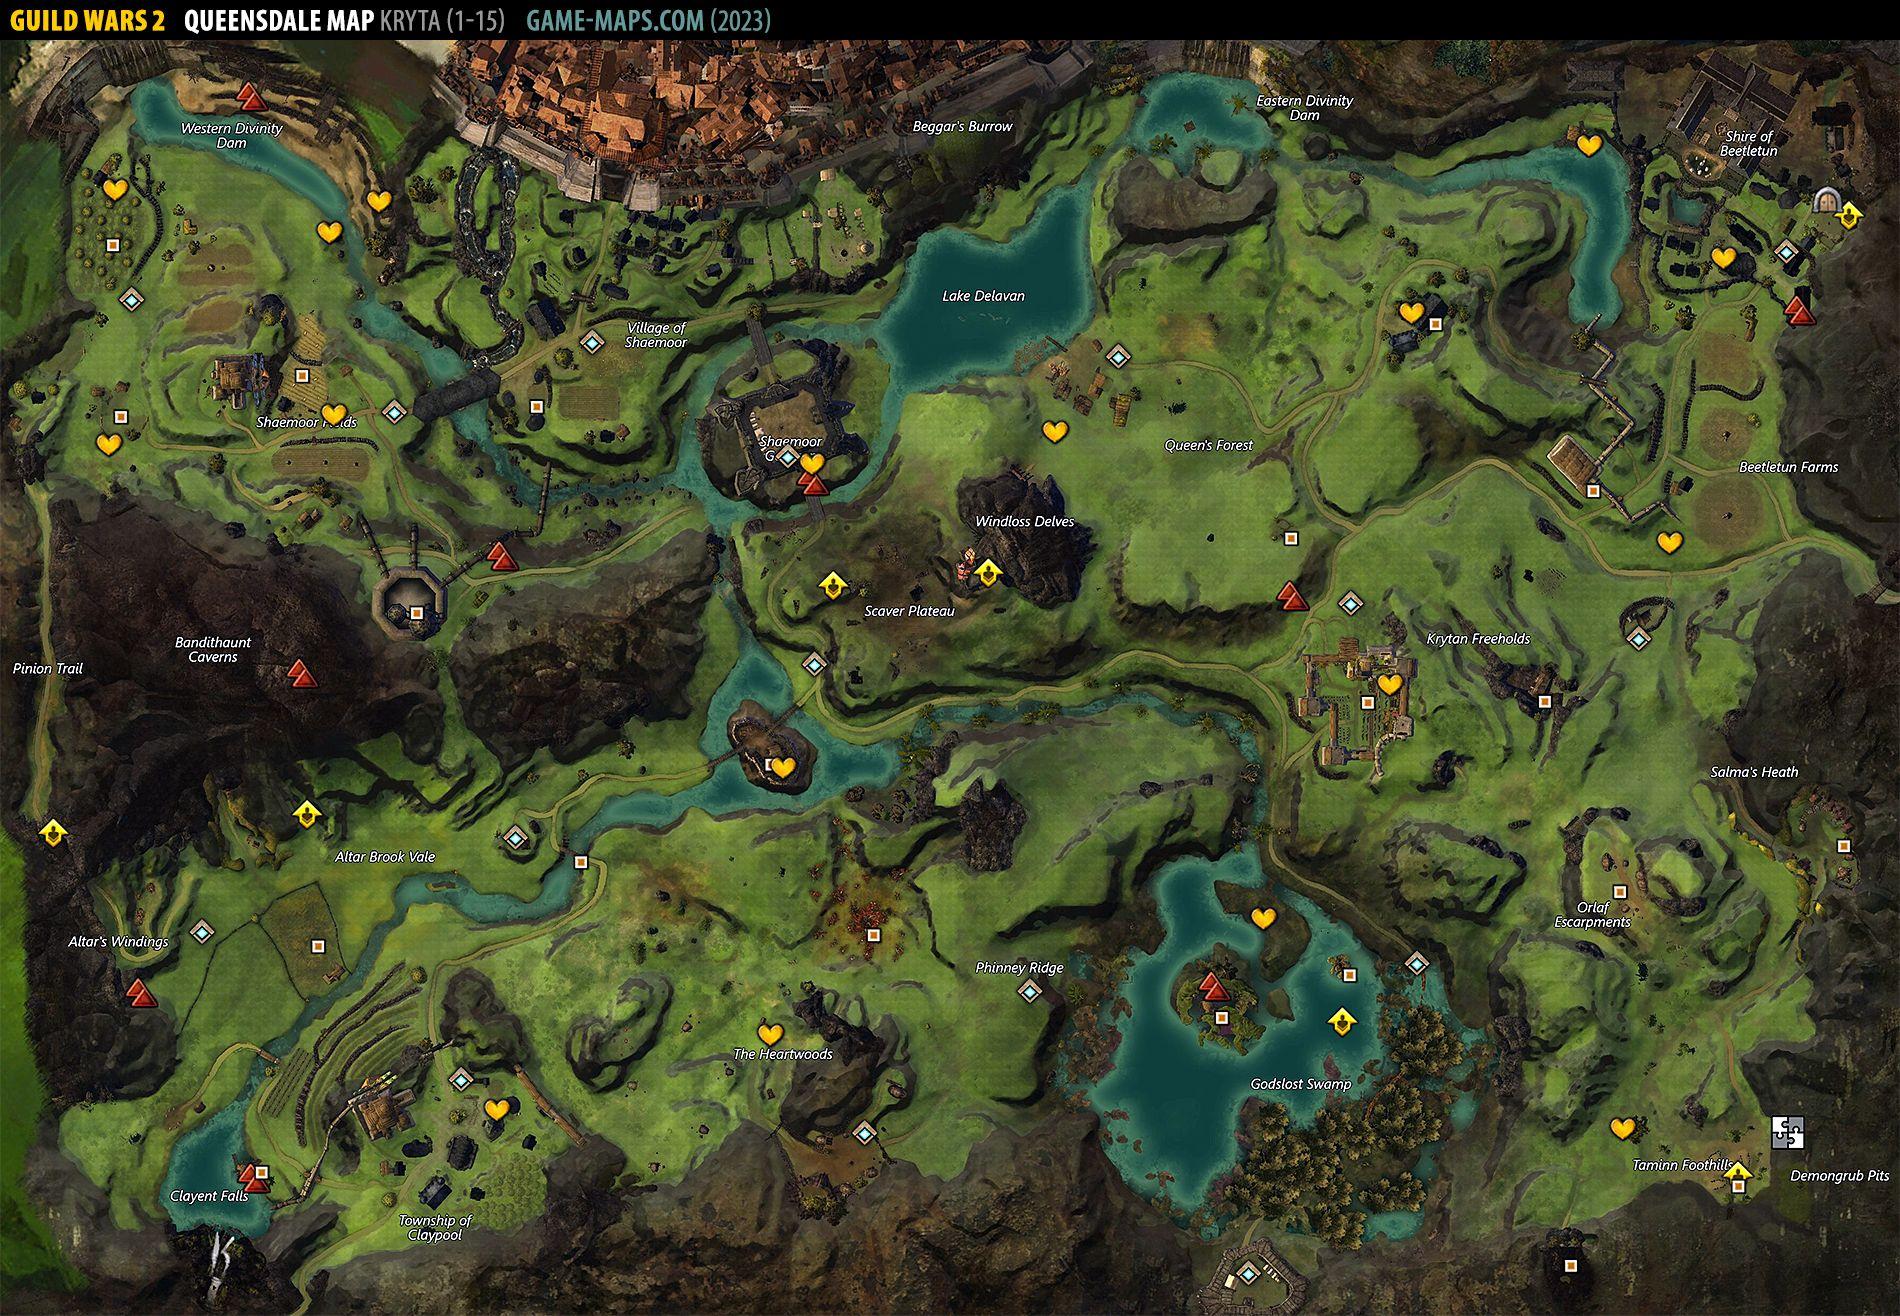 kessex hills map hero points